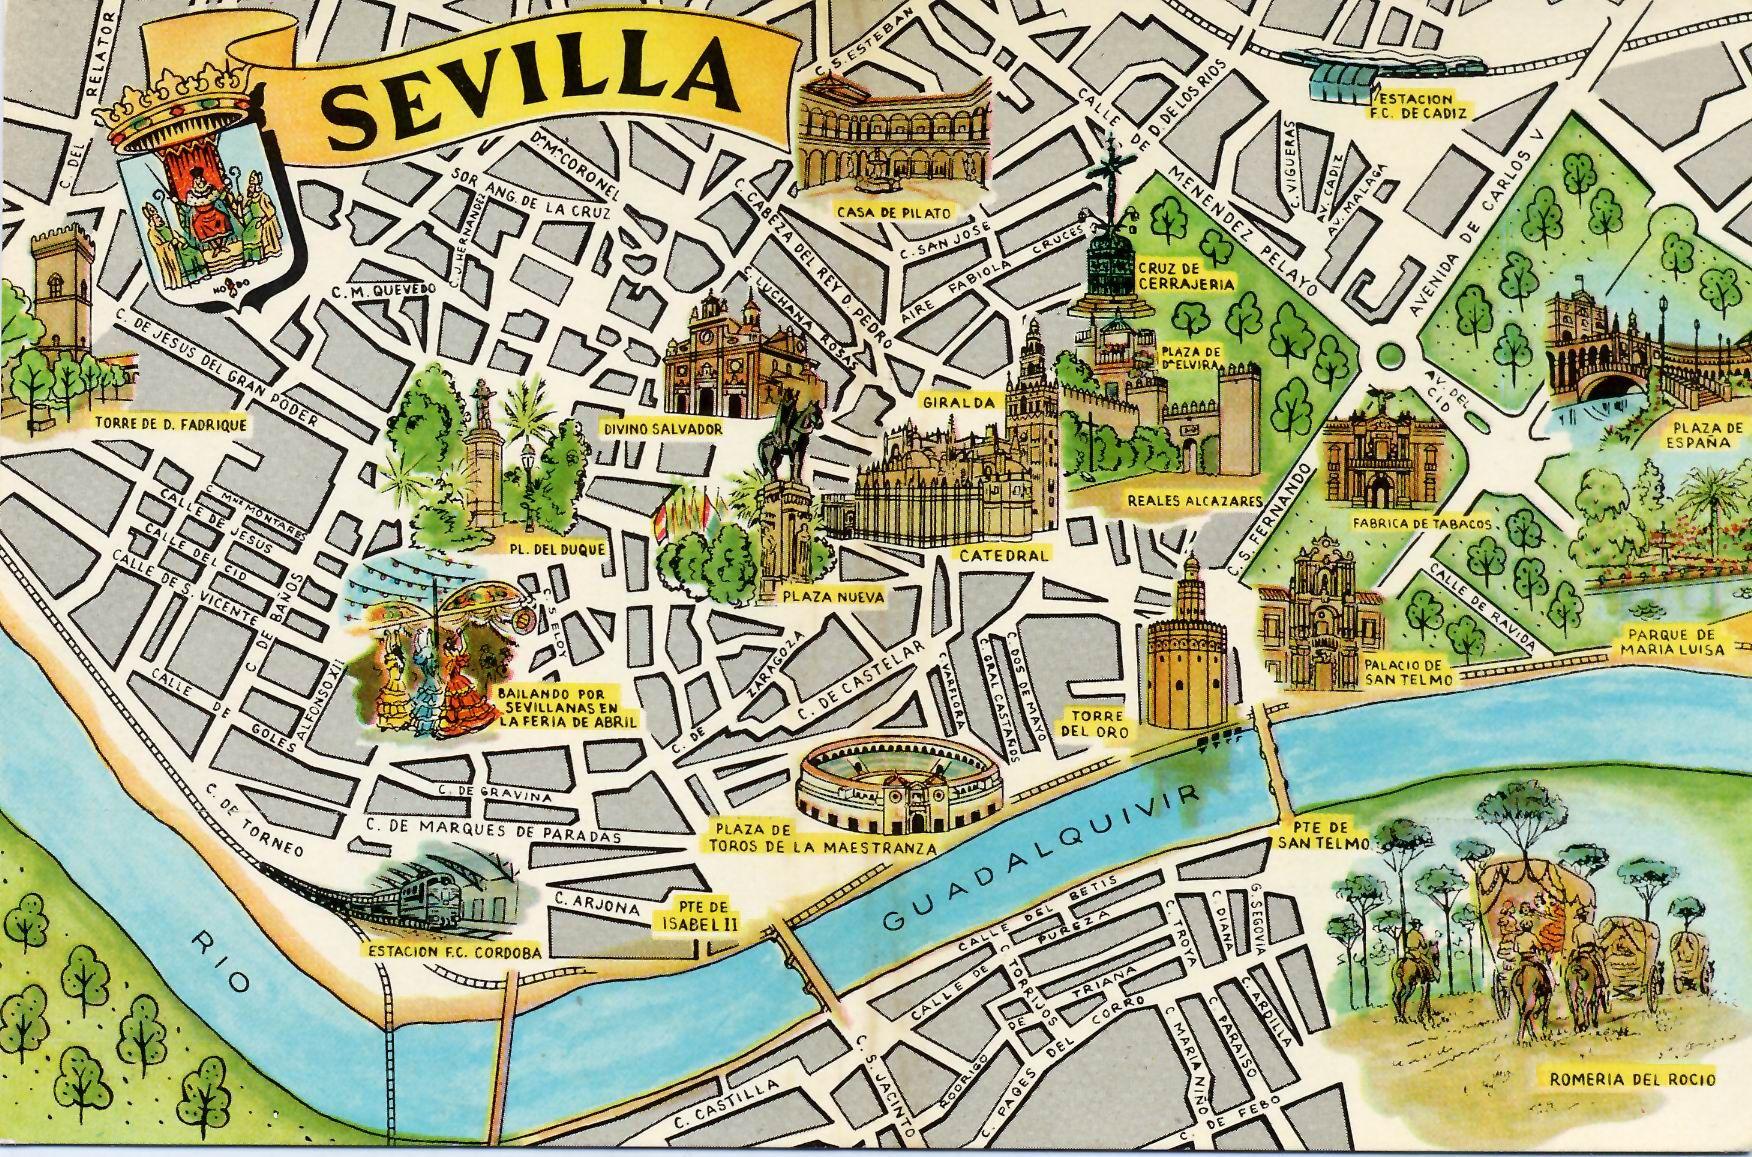 Ana visita sevilla para seis meses Sevilla in 2019